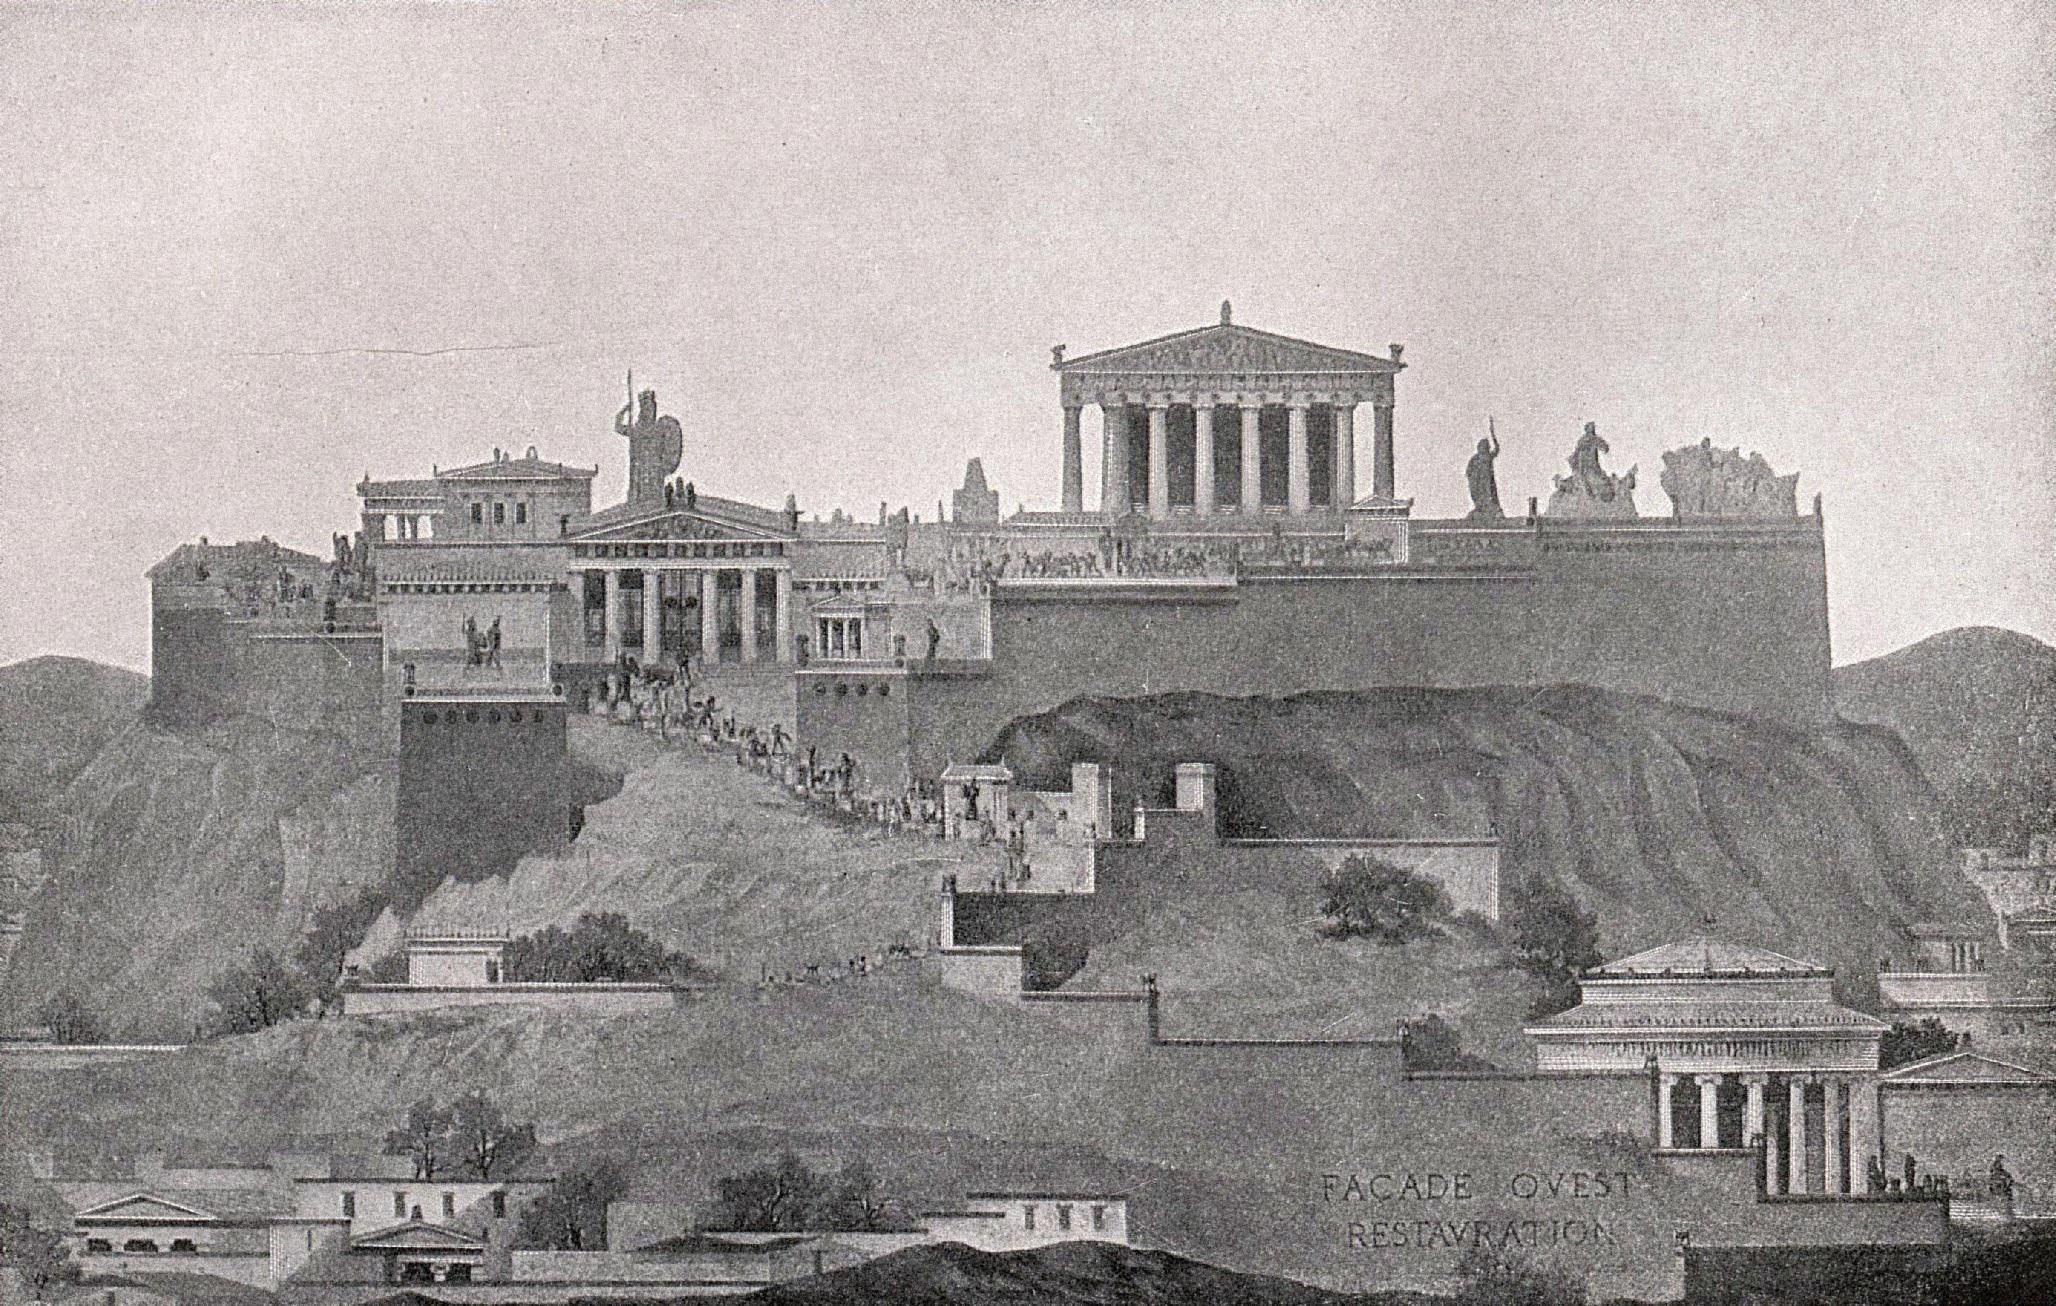 http://upload.wikimedia.org/wikipedia/commons/1/12/Akropolis,_t%C3%A4nkt_i_rekonstrueradt_skick,_Nordisk_familjebok.jpg